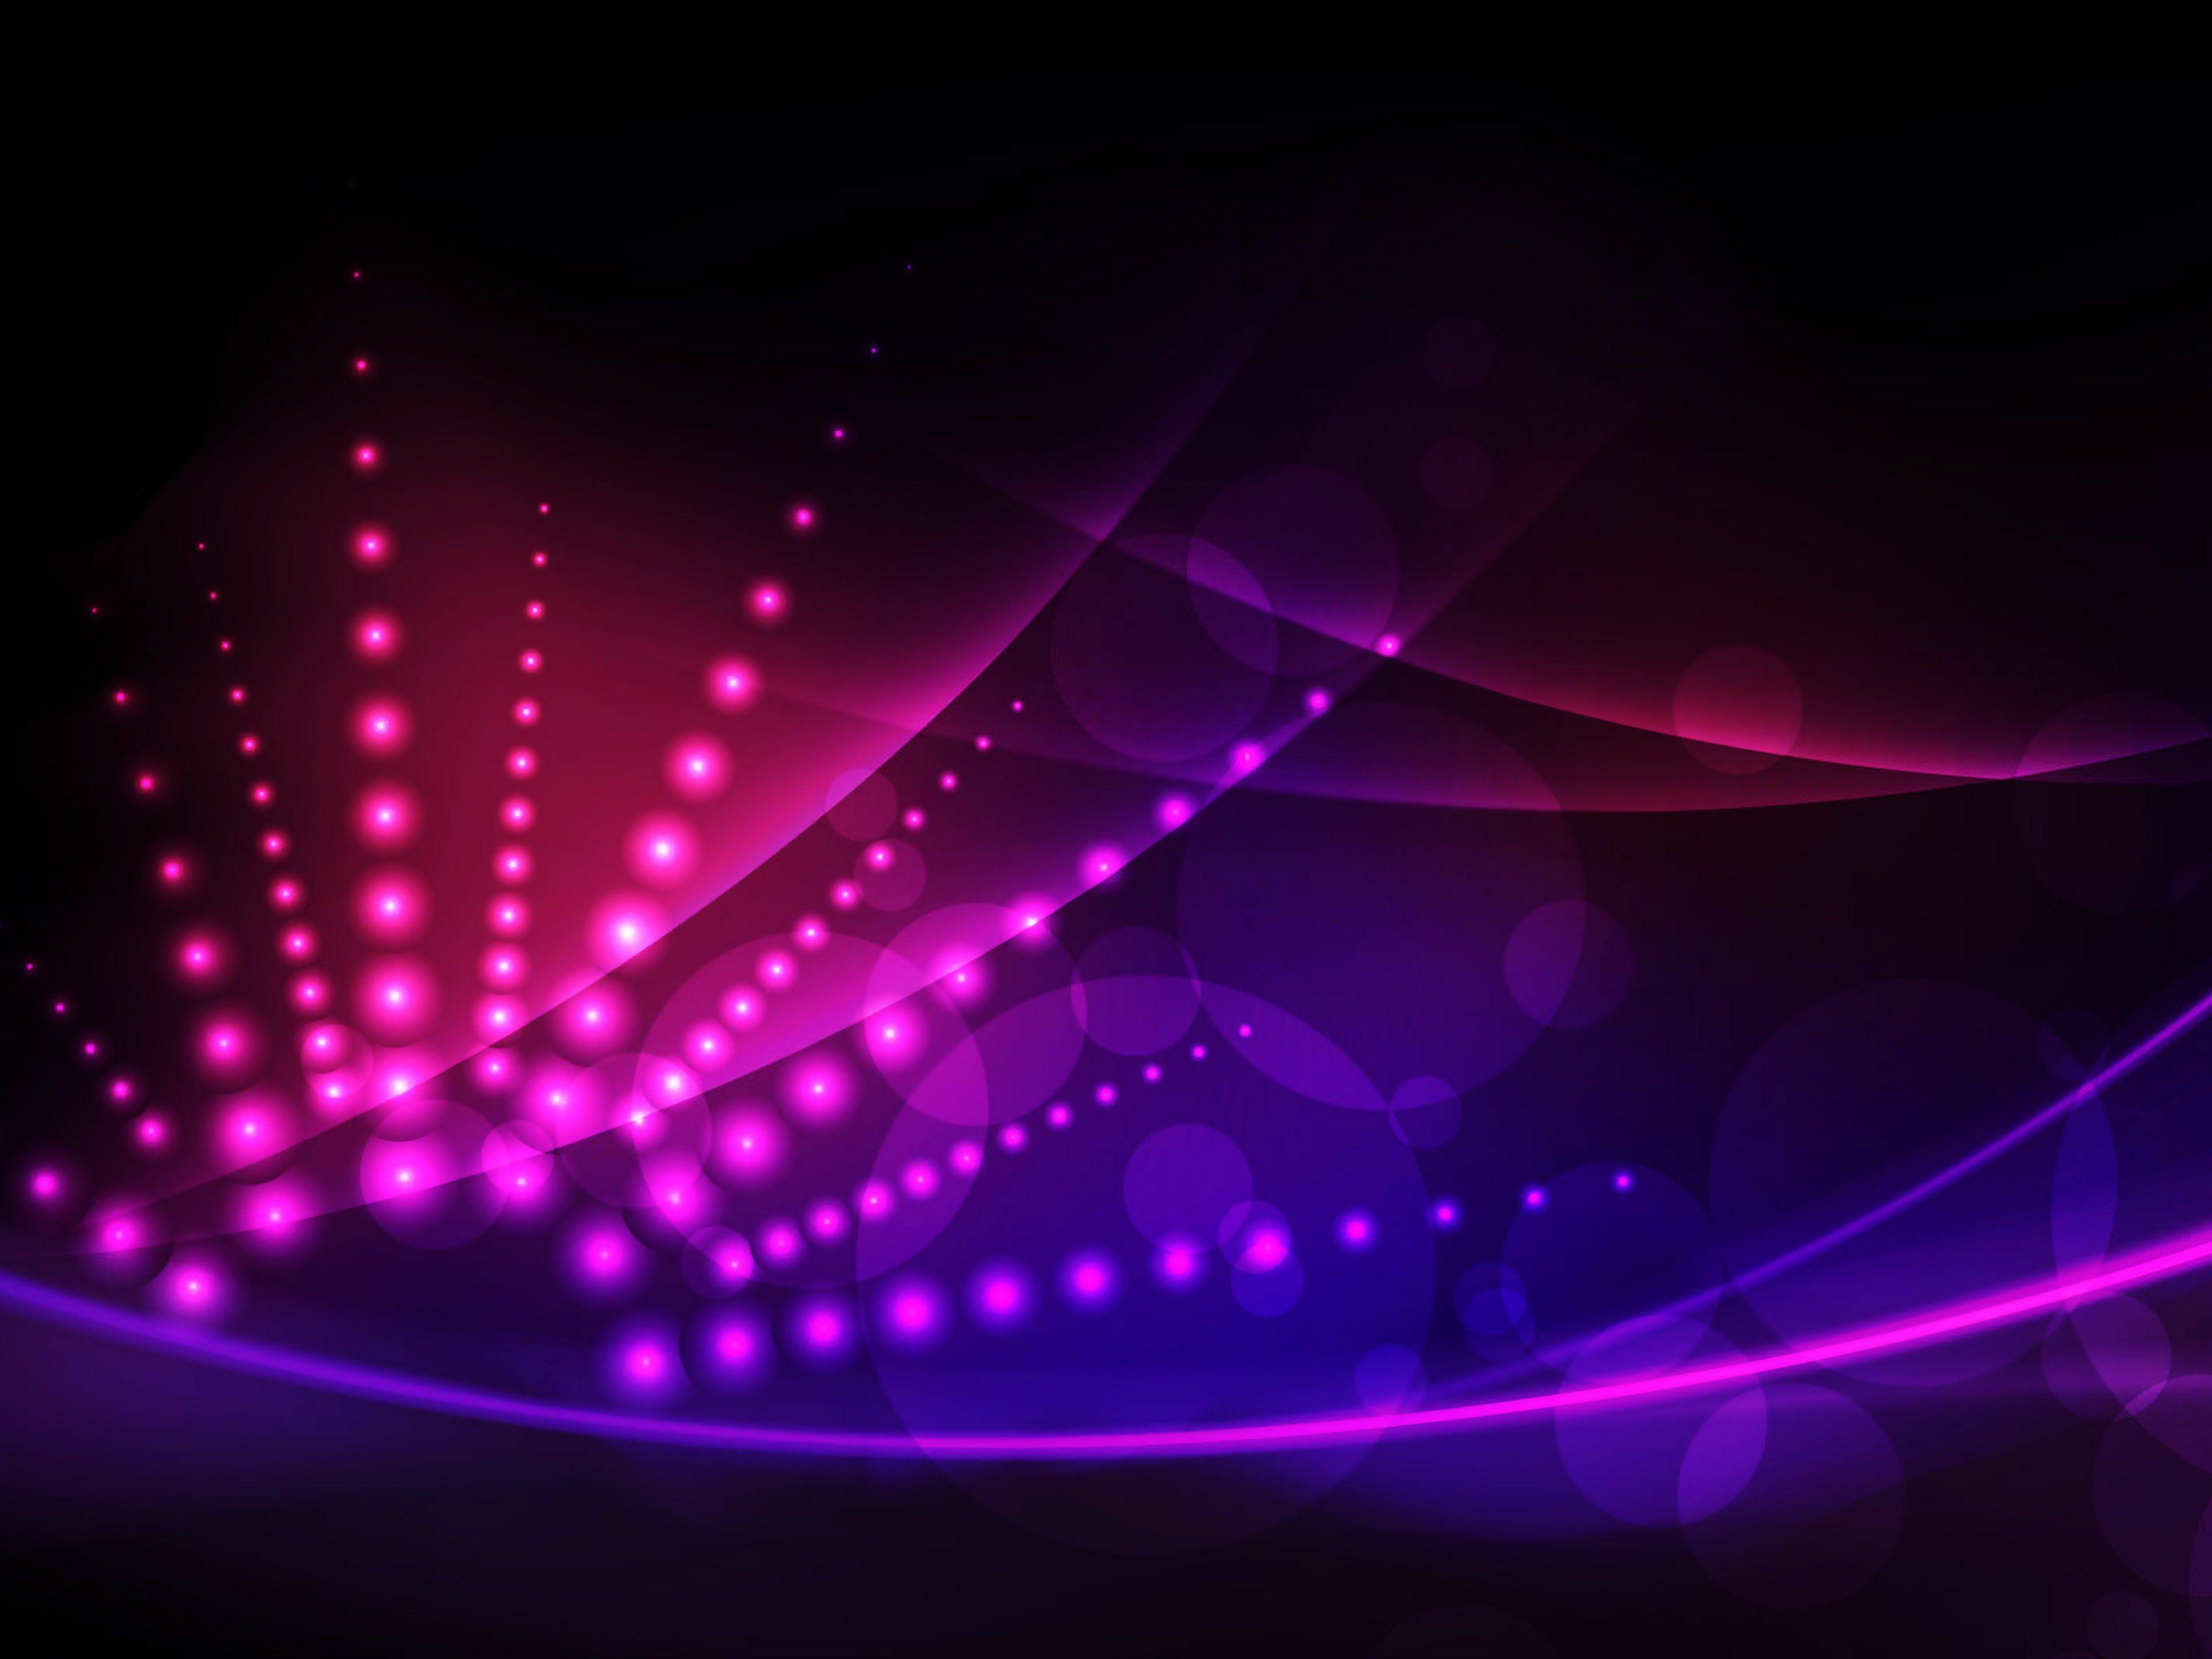 Glow Wallpapers - Wallpaper Cave